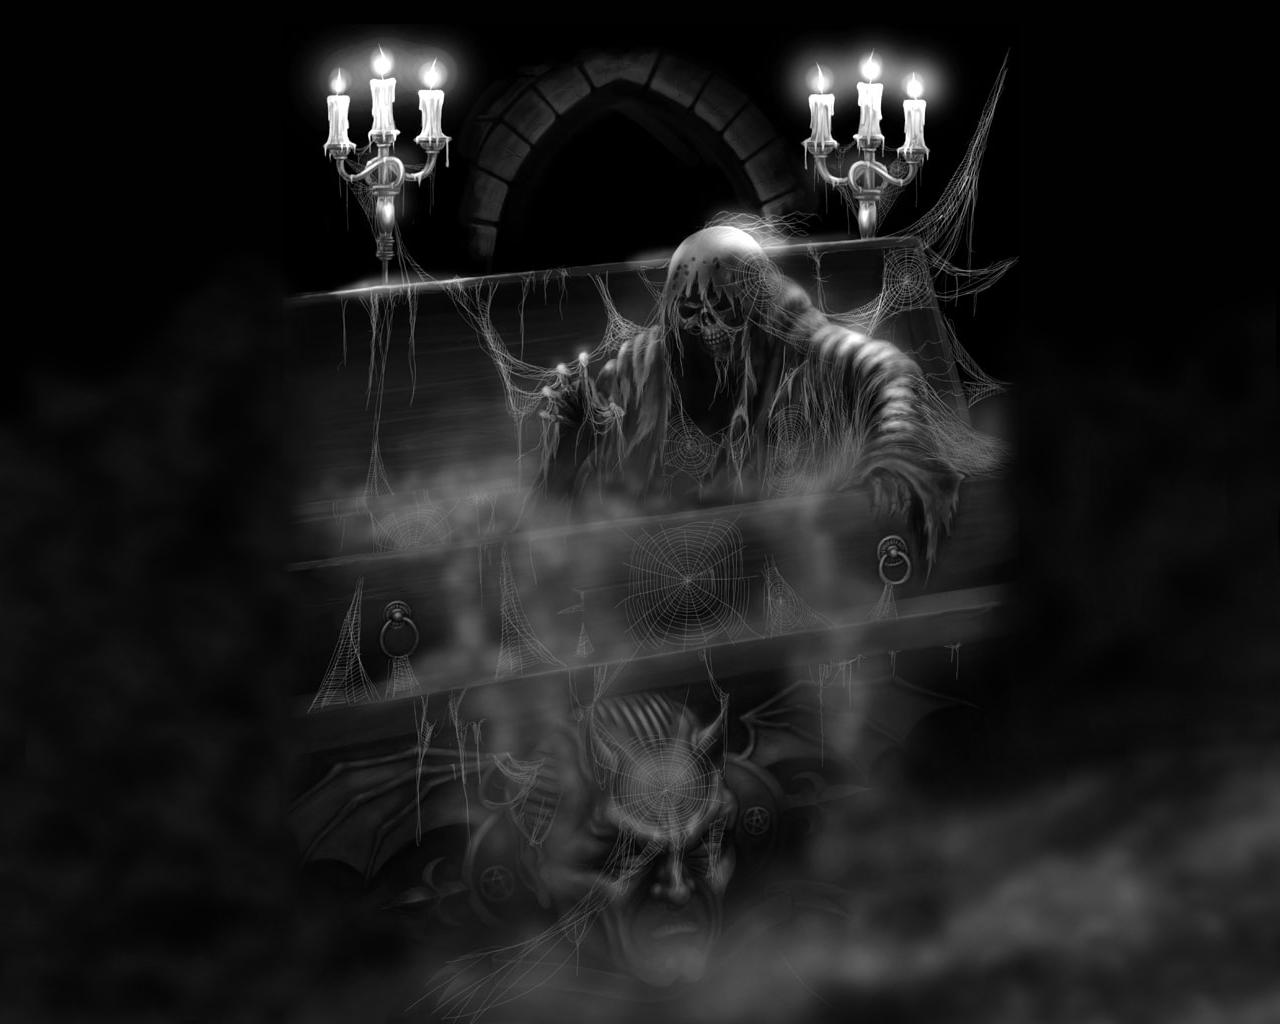 http://1.bp.blogspot.com/-_tPbop4_R9E/TqPPR5HipVI/AAAAAAAACn8/kw3rIUAgBUE/s1600/Skull+_wallpapers_Dark_Skeleton_Coffin.jpg